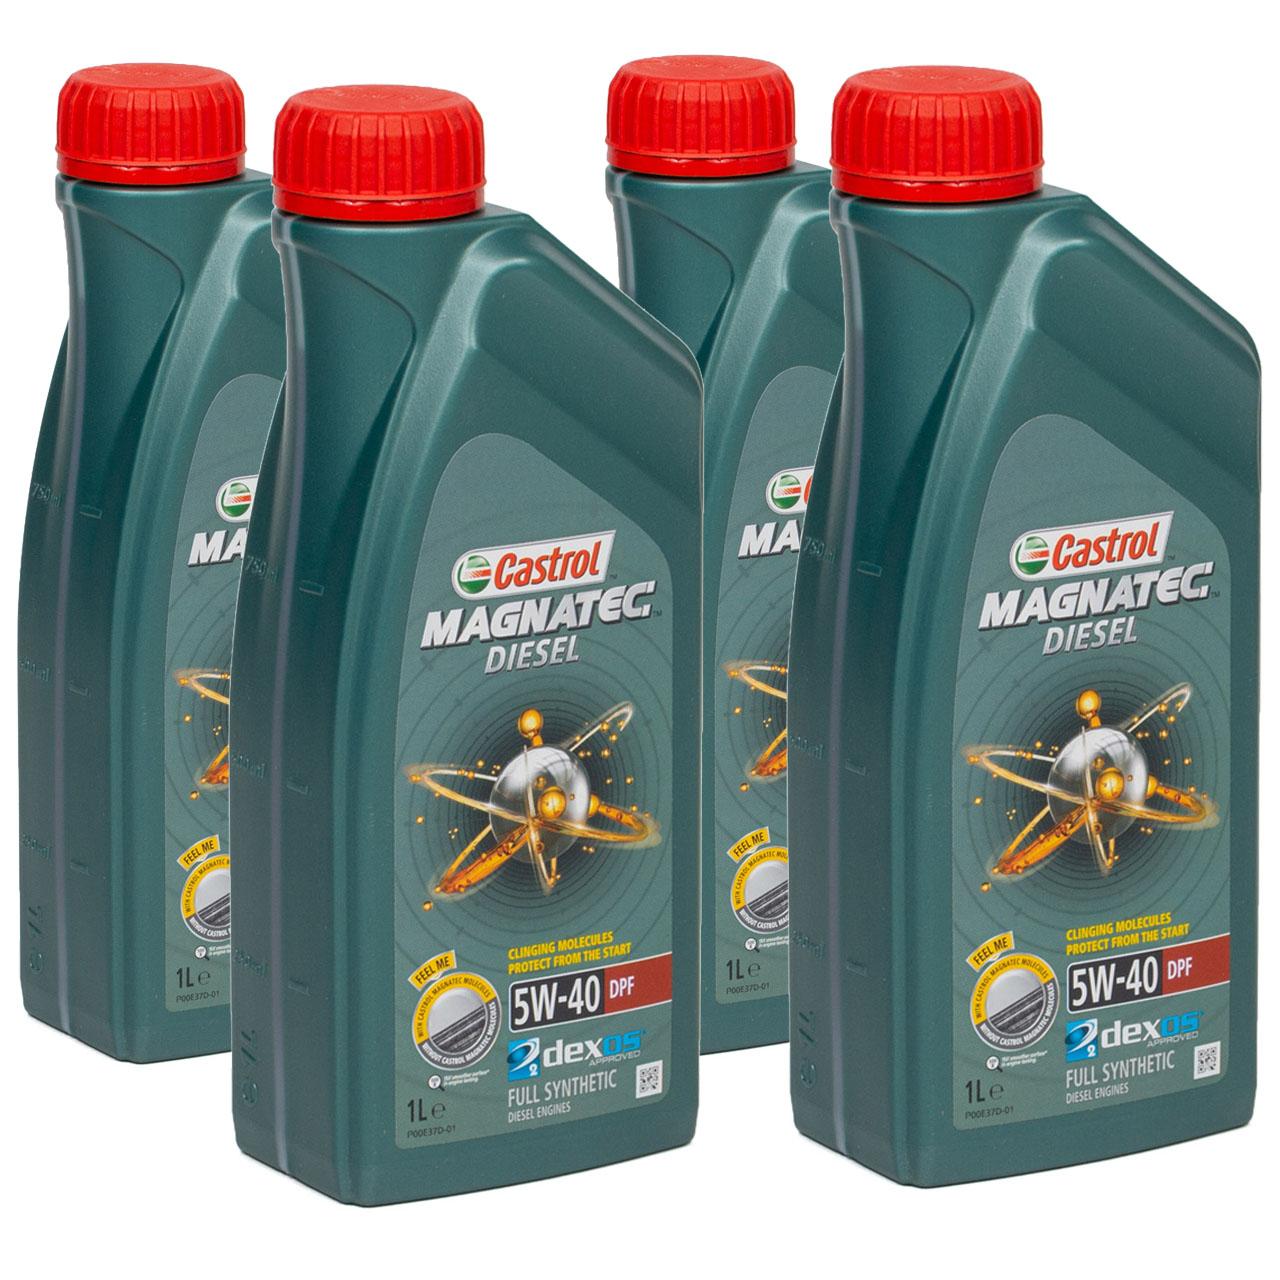 CASTROL Magnatec DIESEL DPF Motoröl Öl 5W40 dexos2 Ford WSS-M2C917-A - 4 Liter